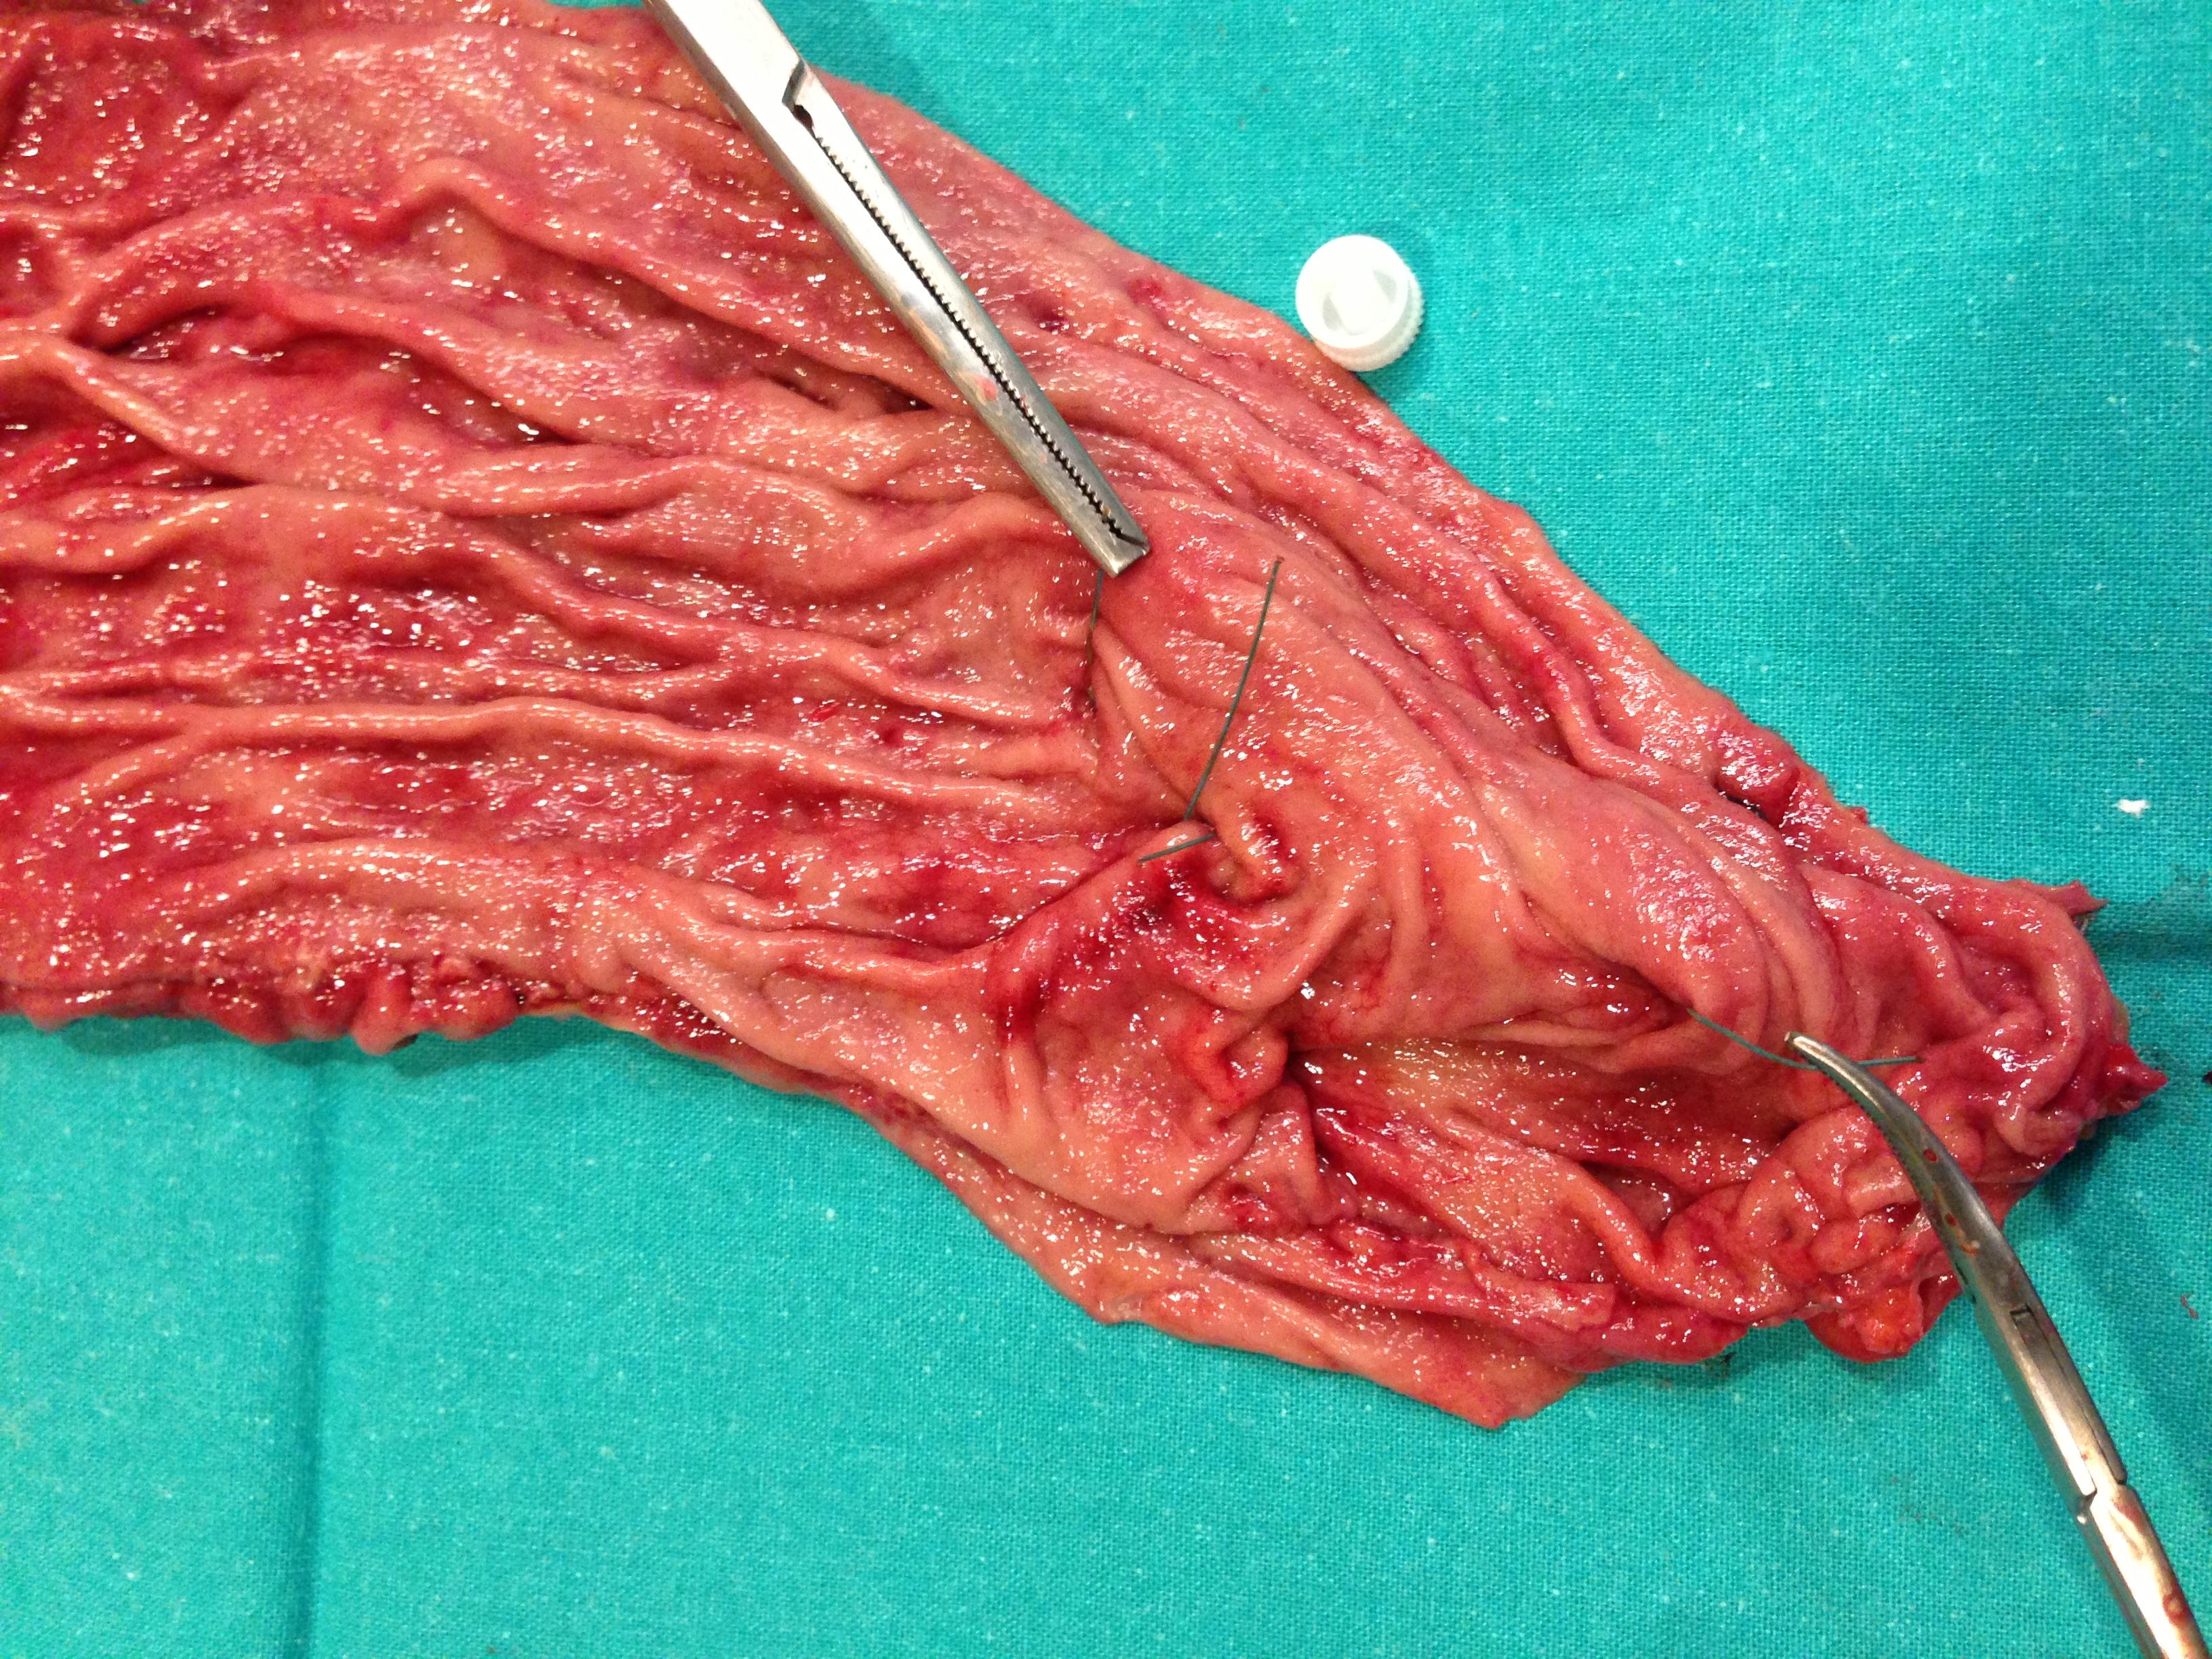 Reduccion de abdomen sin cirugia medellin